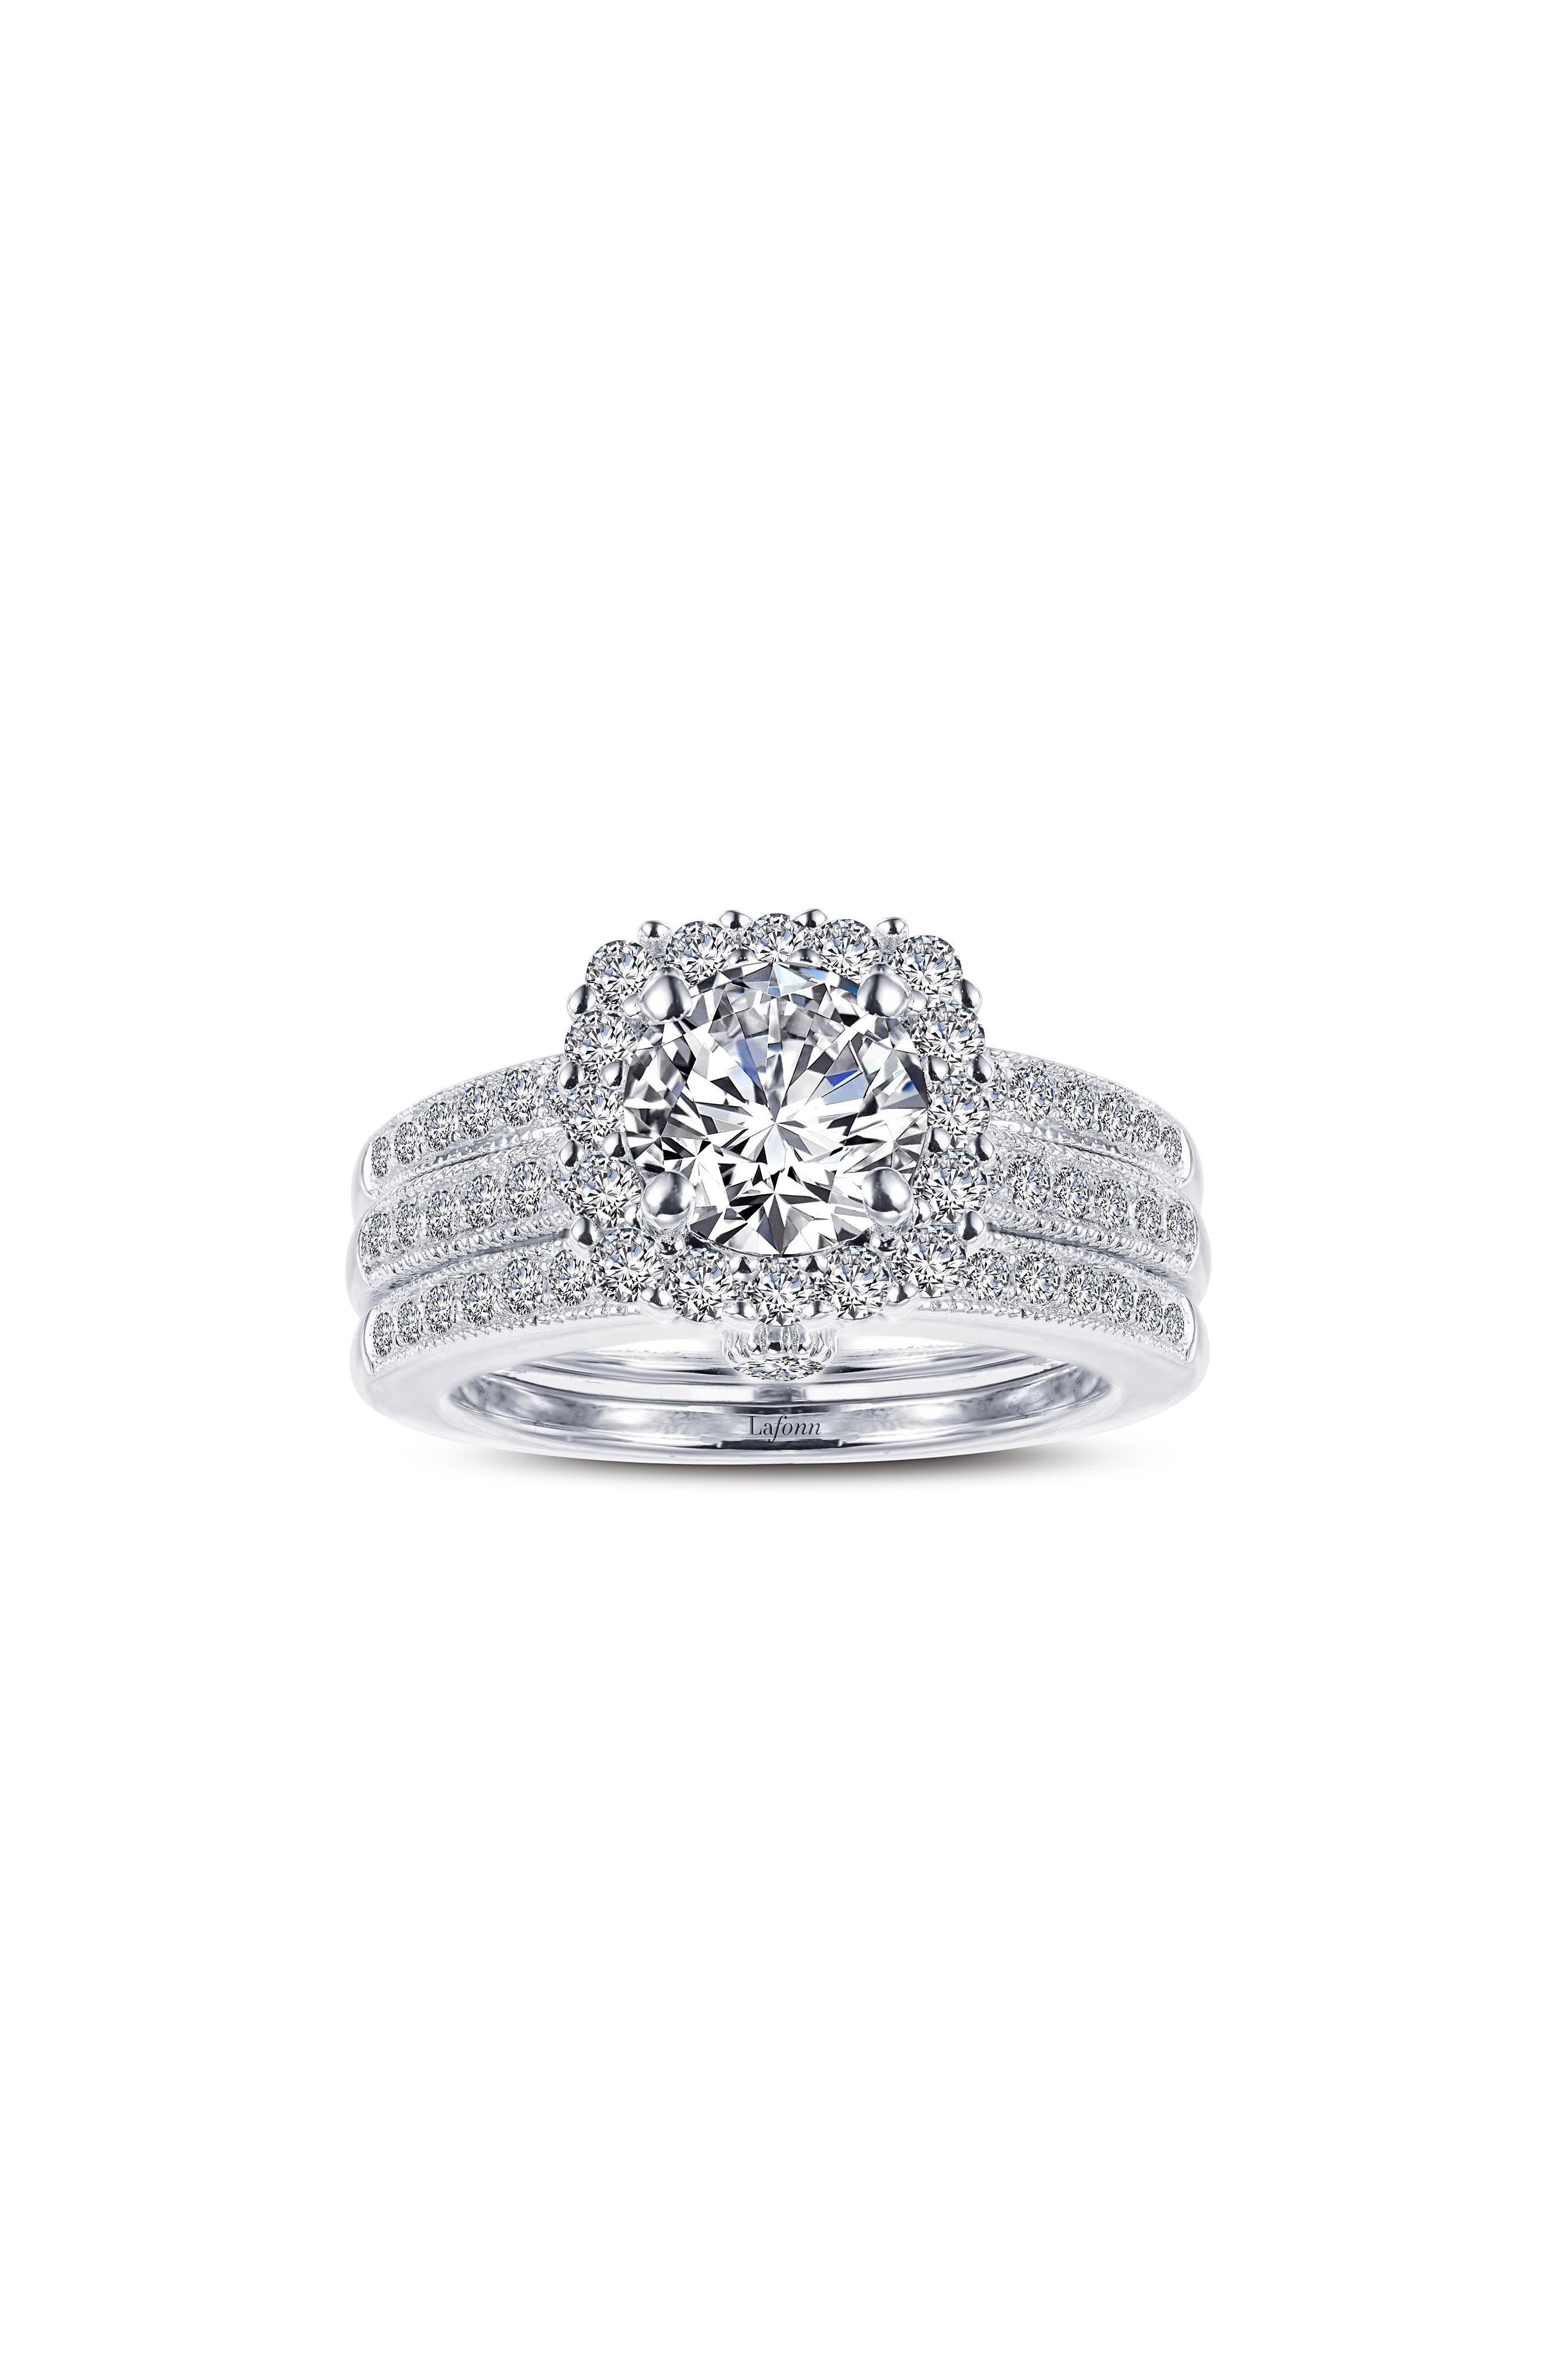 Infinite Love Simulated Diamond Wedding Ring Set